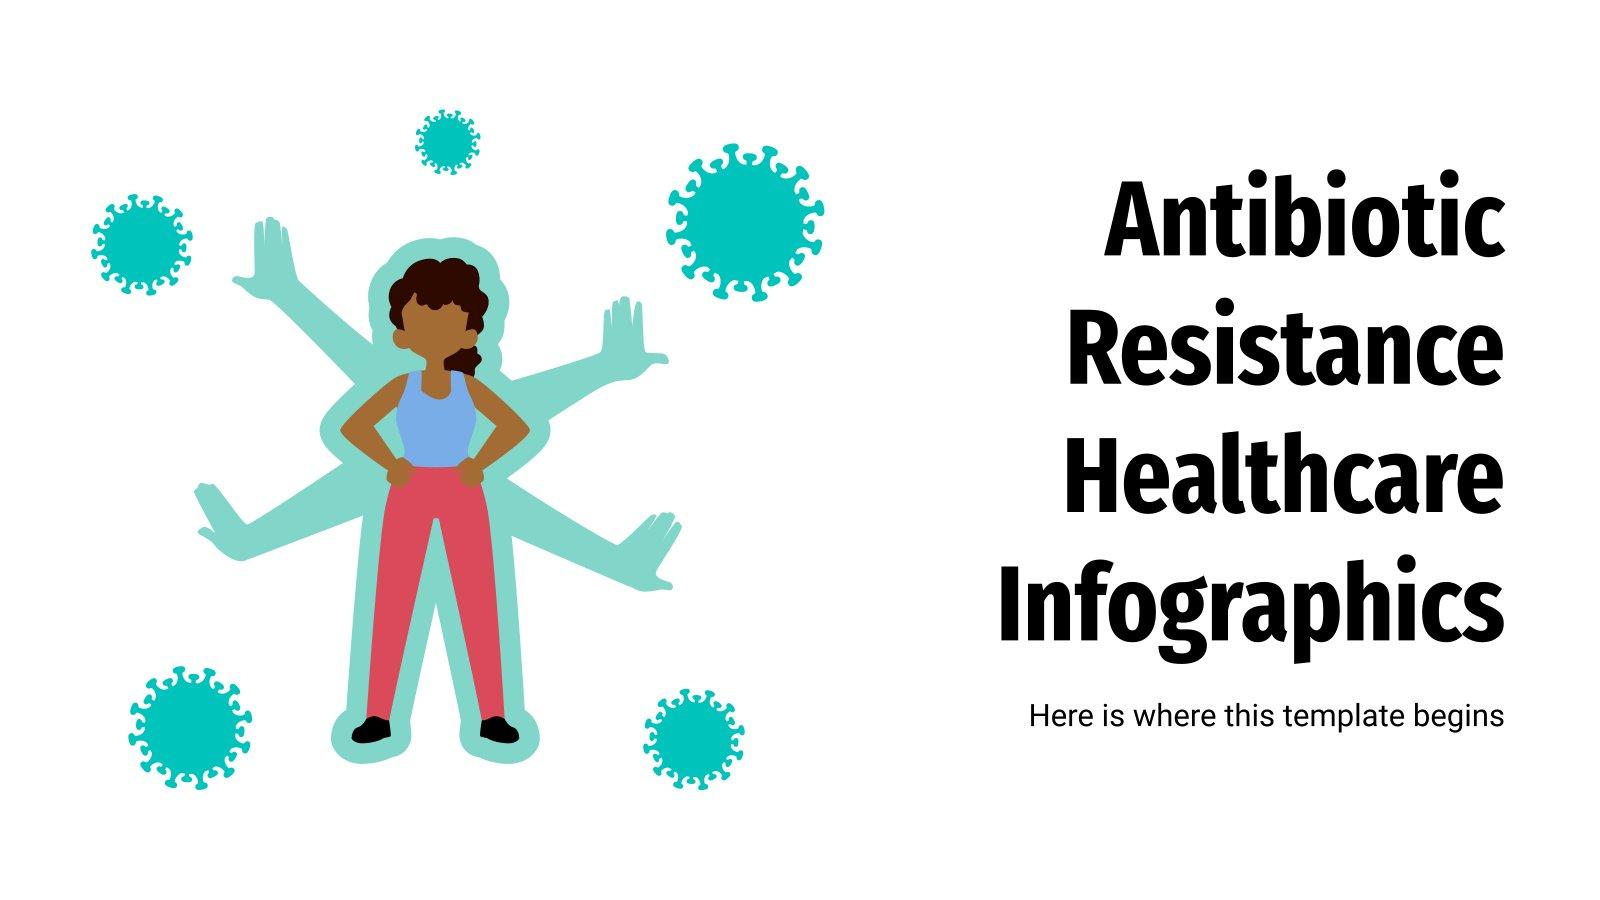 Antibiotic Resistance Healthcare Infographics presentation template